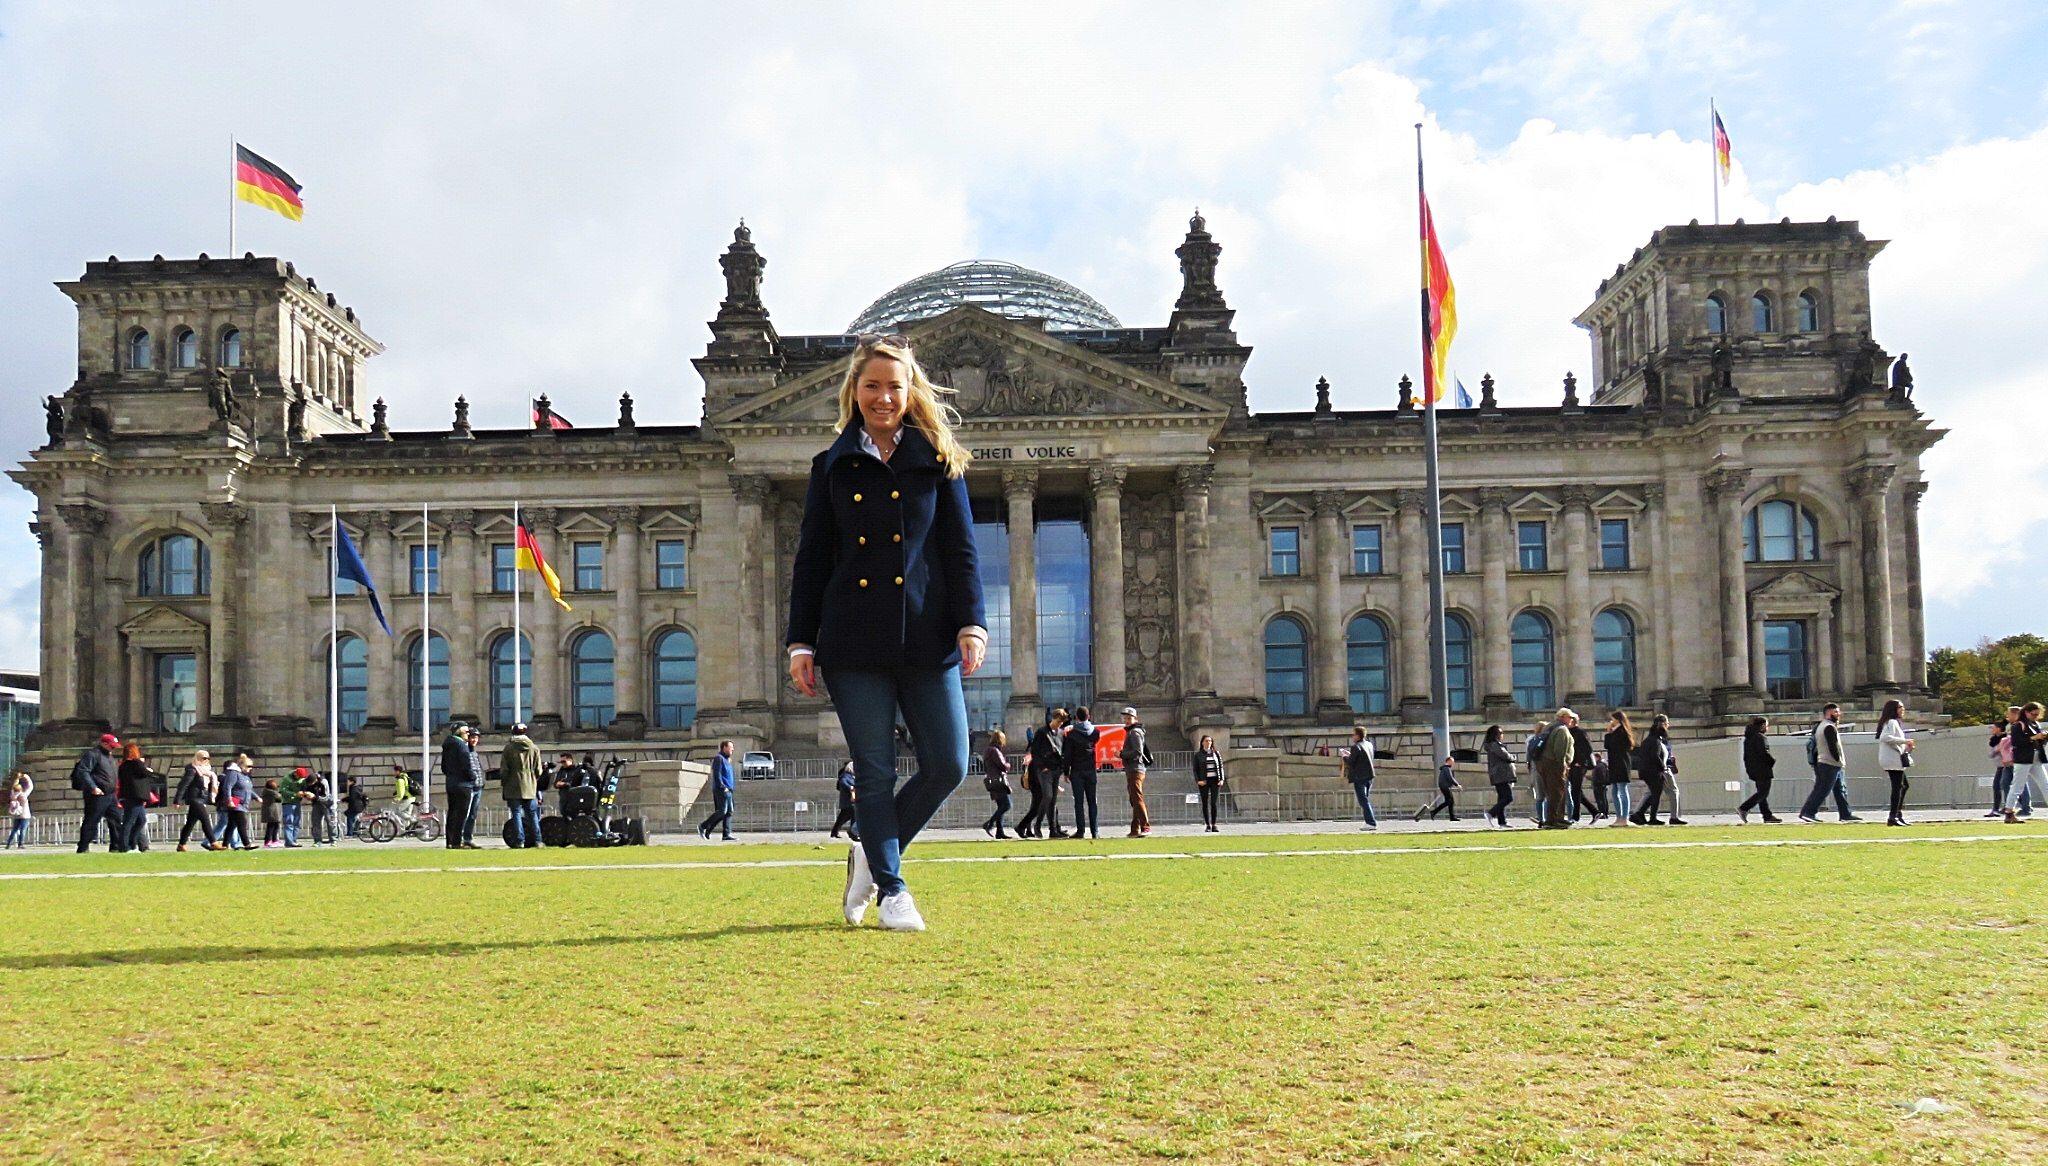 Riksdagshuset Berlin